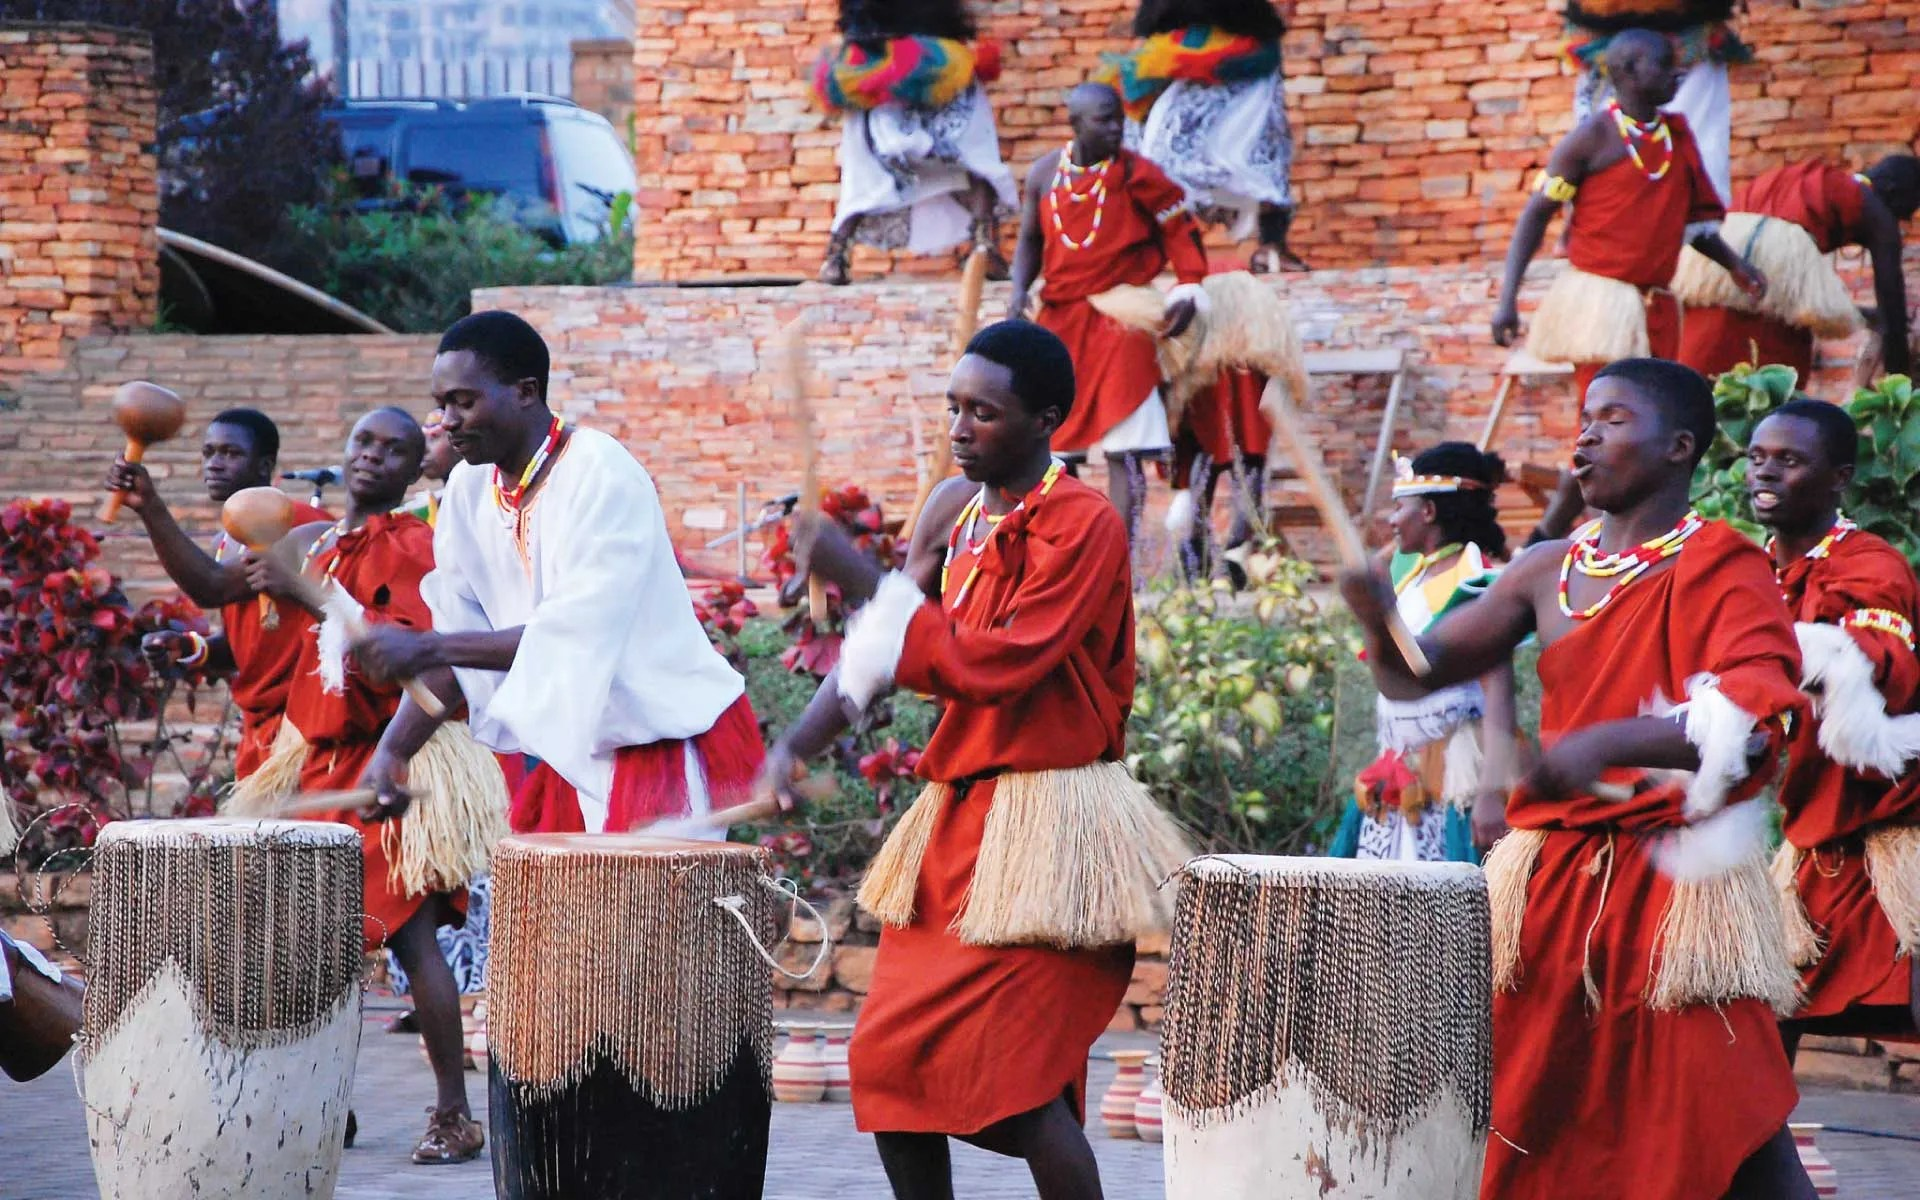 Rwanda Uganda Culture, Music, People Tour